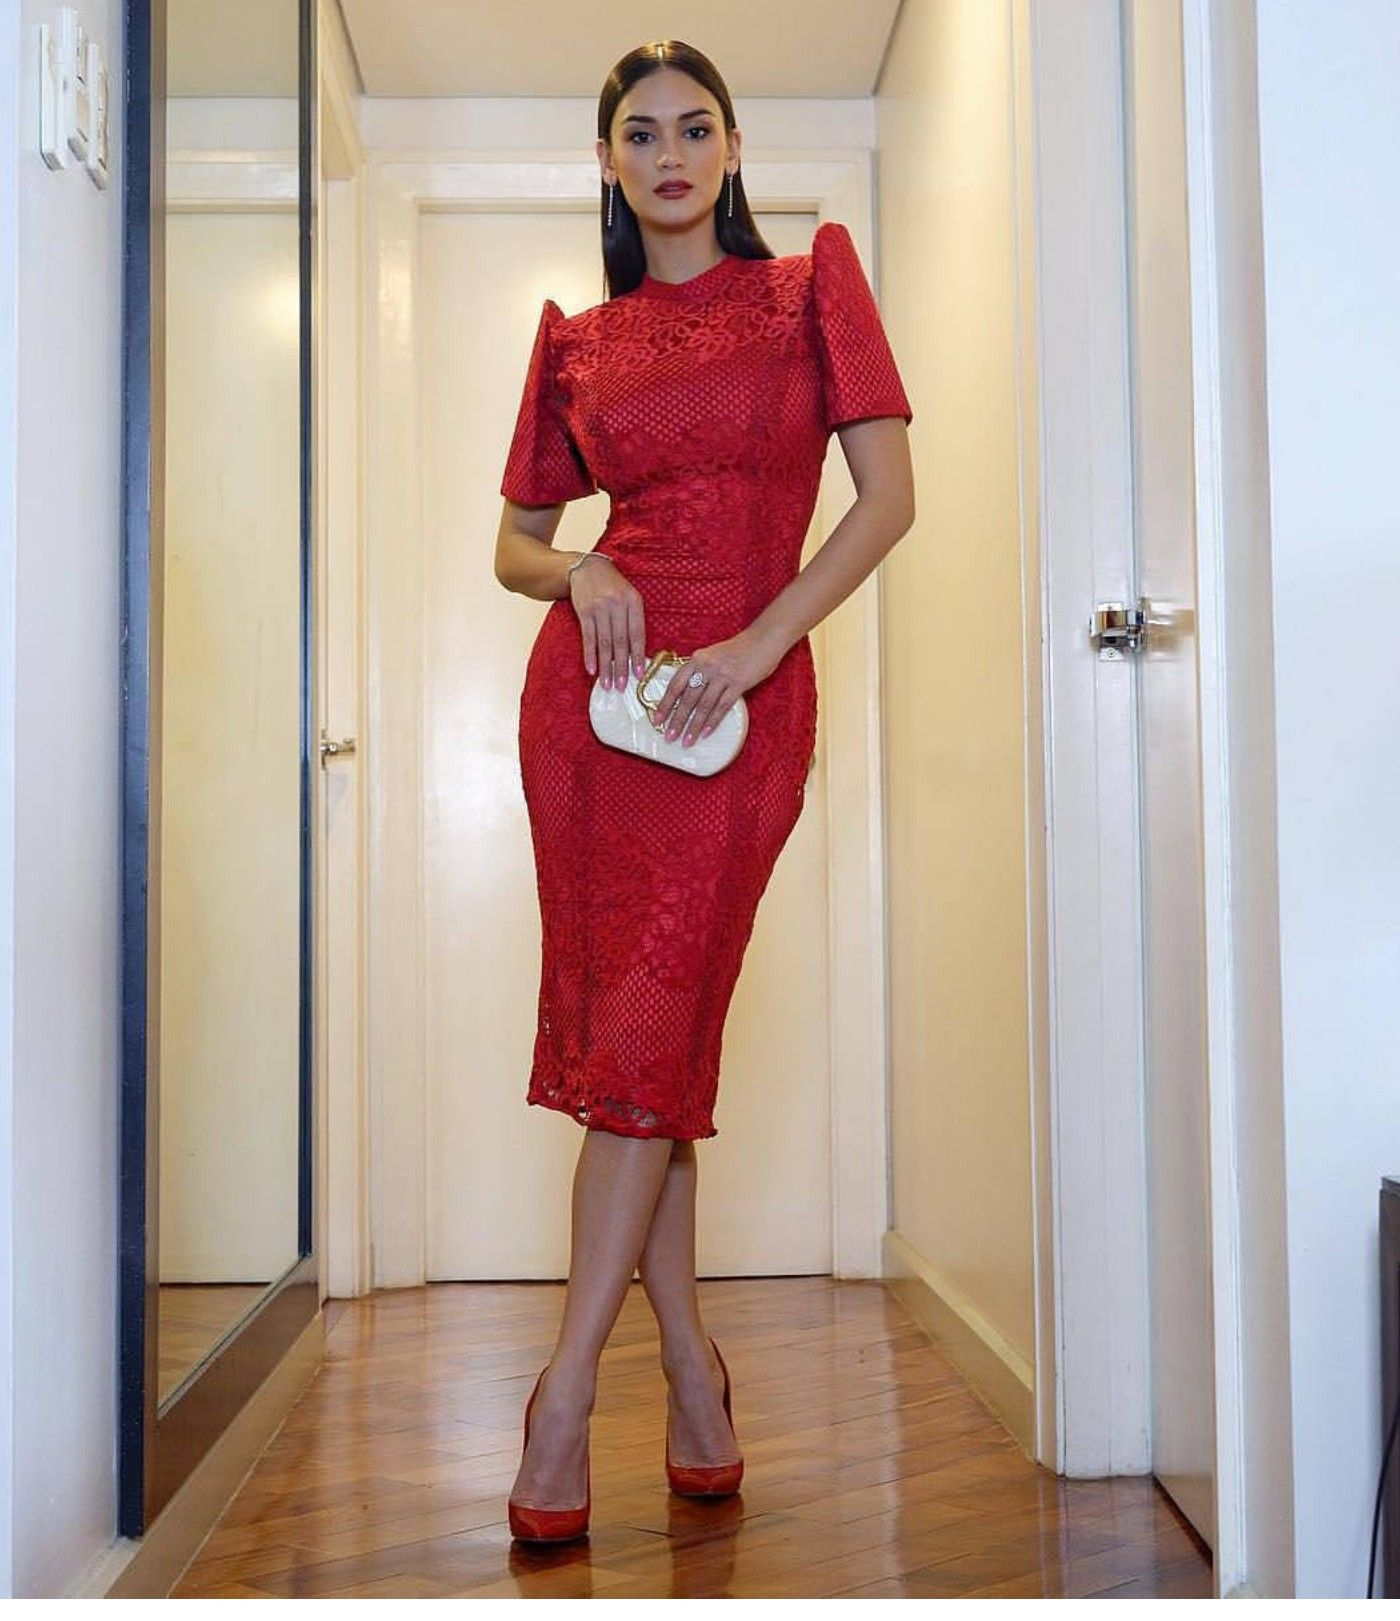 Pin by Angela Abualatta on Dream Wedding | Pinterest | Filipiniana ...